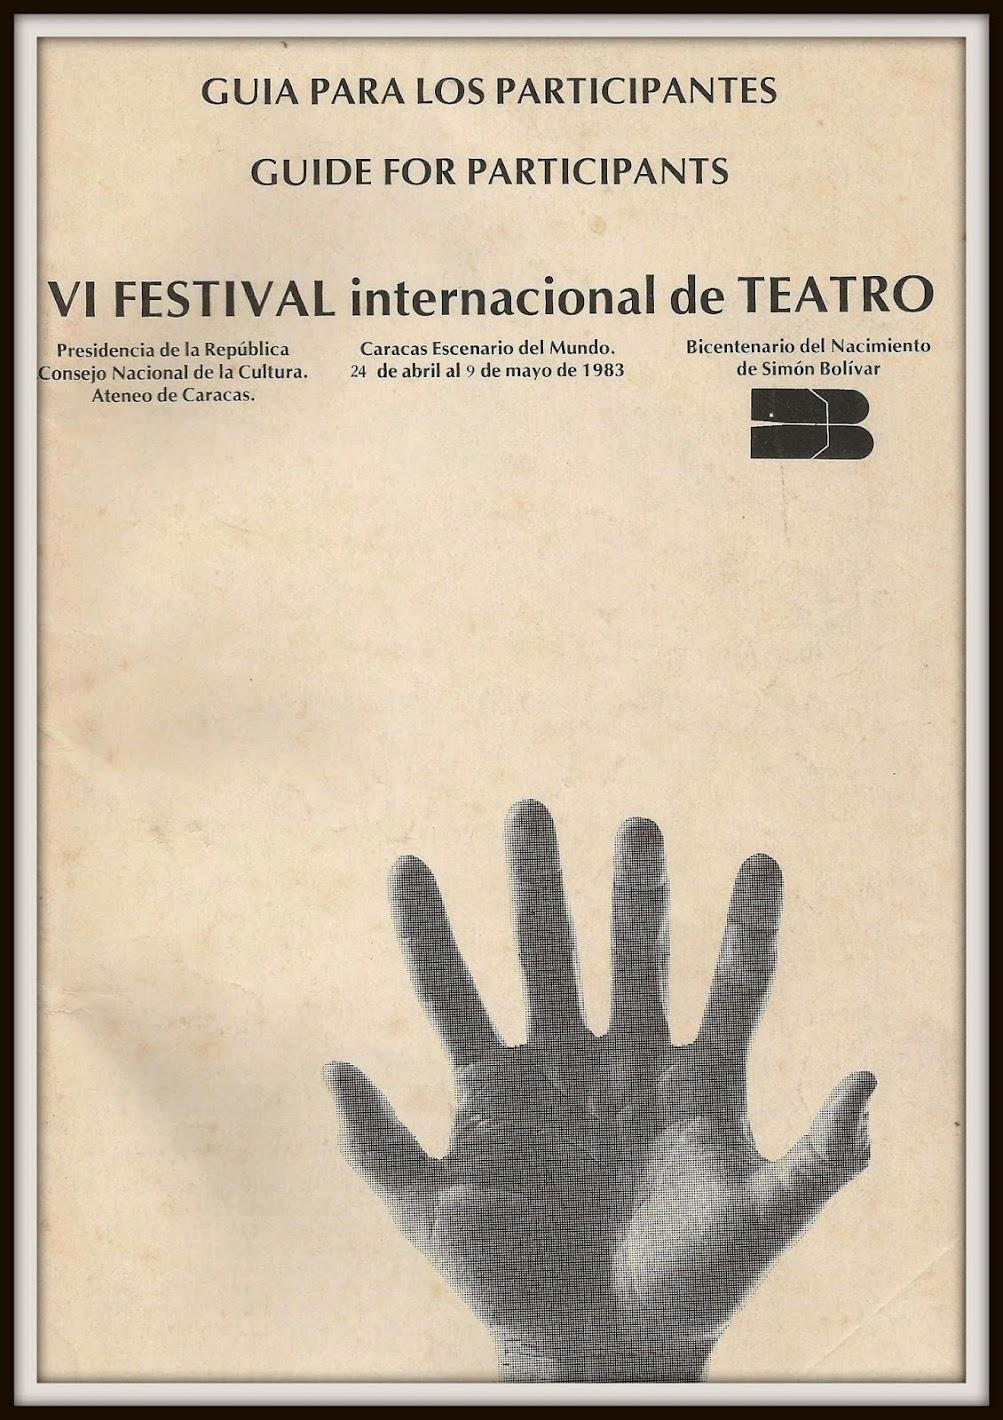 VI Festival Internacional de Teatro de Caracas 1983